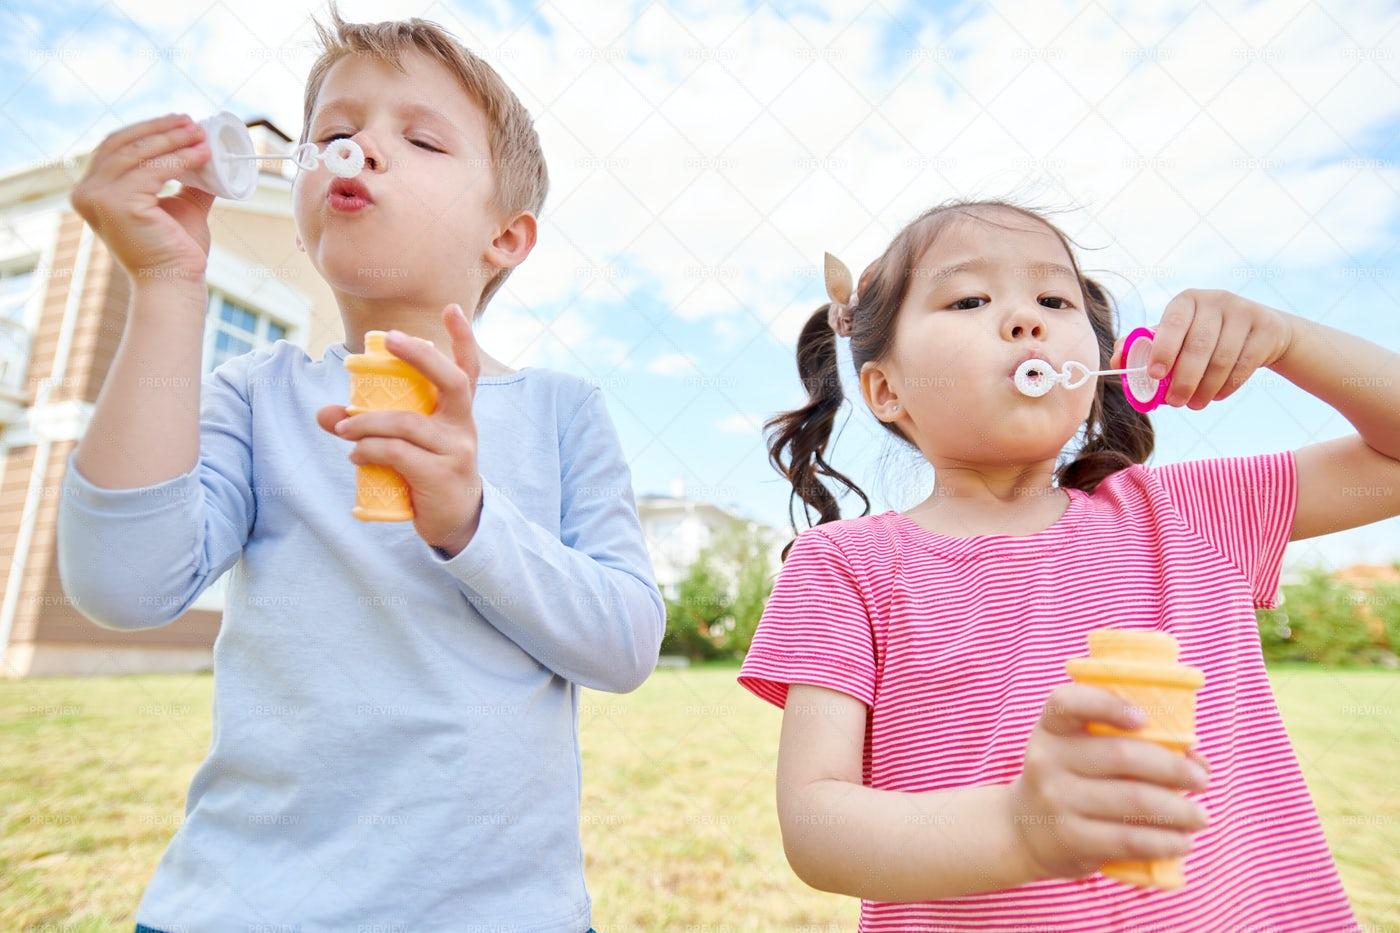 Happy Children Blowing Bubbles: Stock Photos